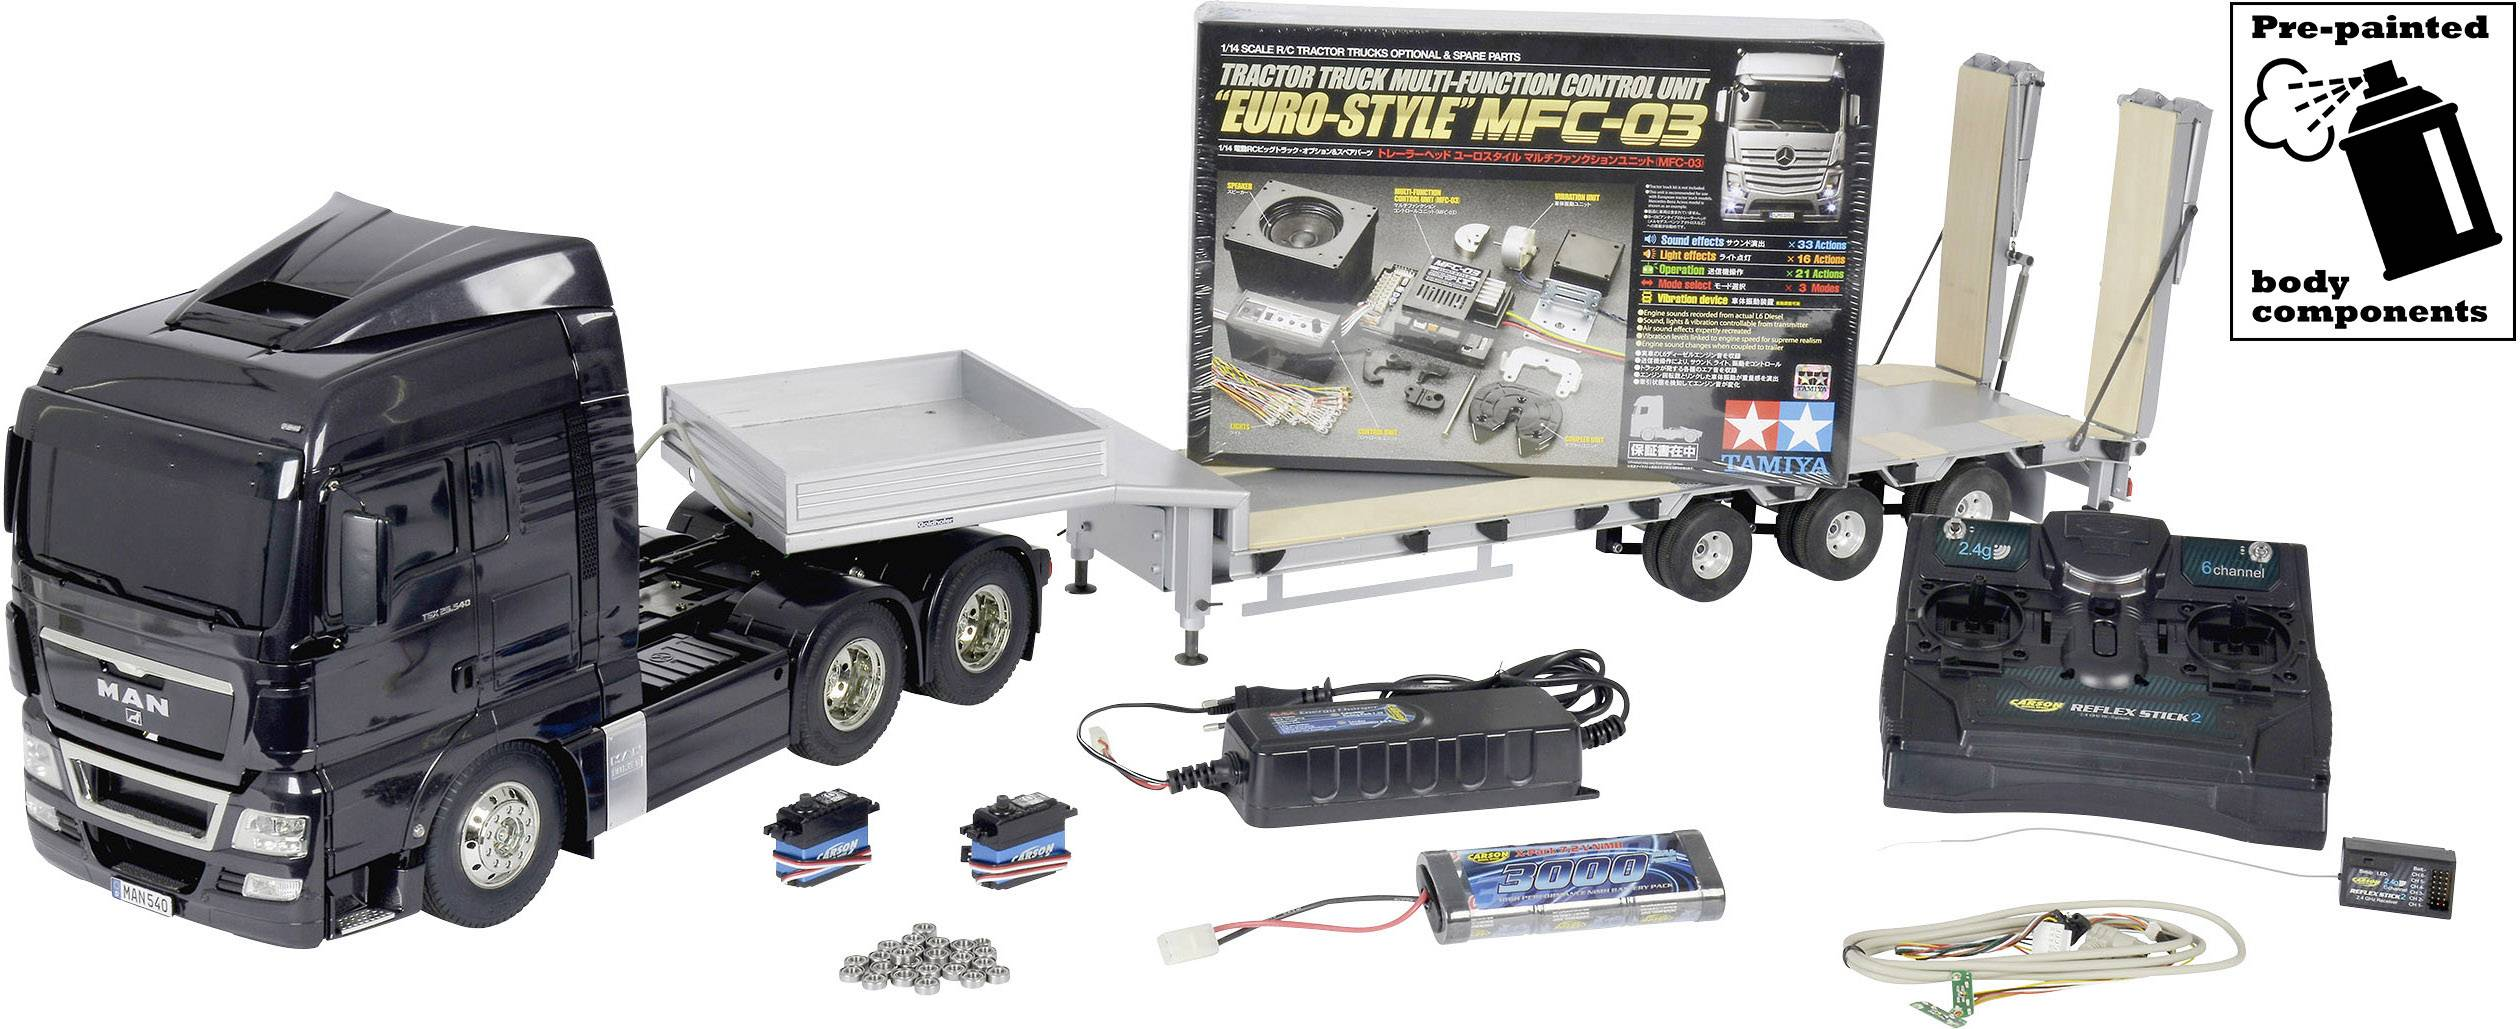 Tamiya 56346 Man Tgx 26 540 1 14 Electric Rc Model Truck Deluxe Saver Set Pre Painted Conrad Com